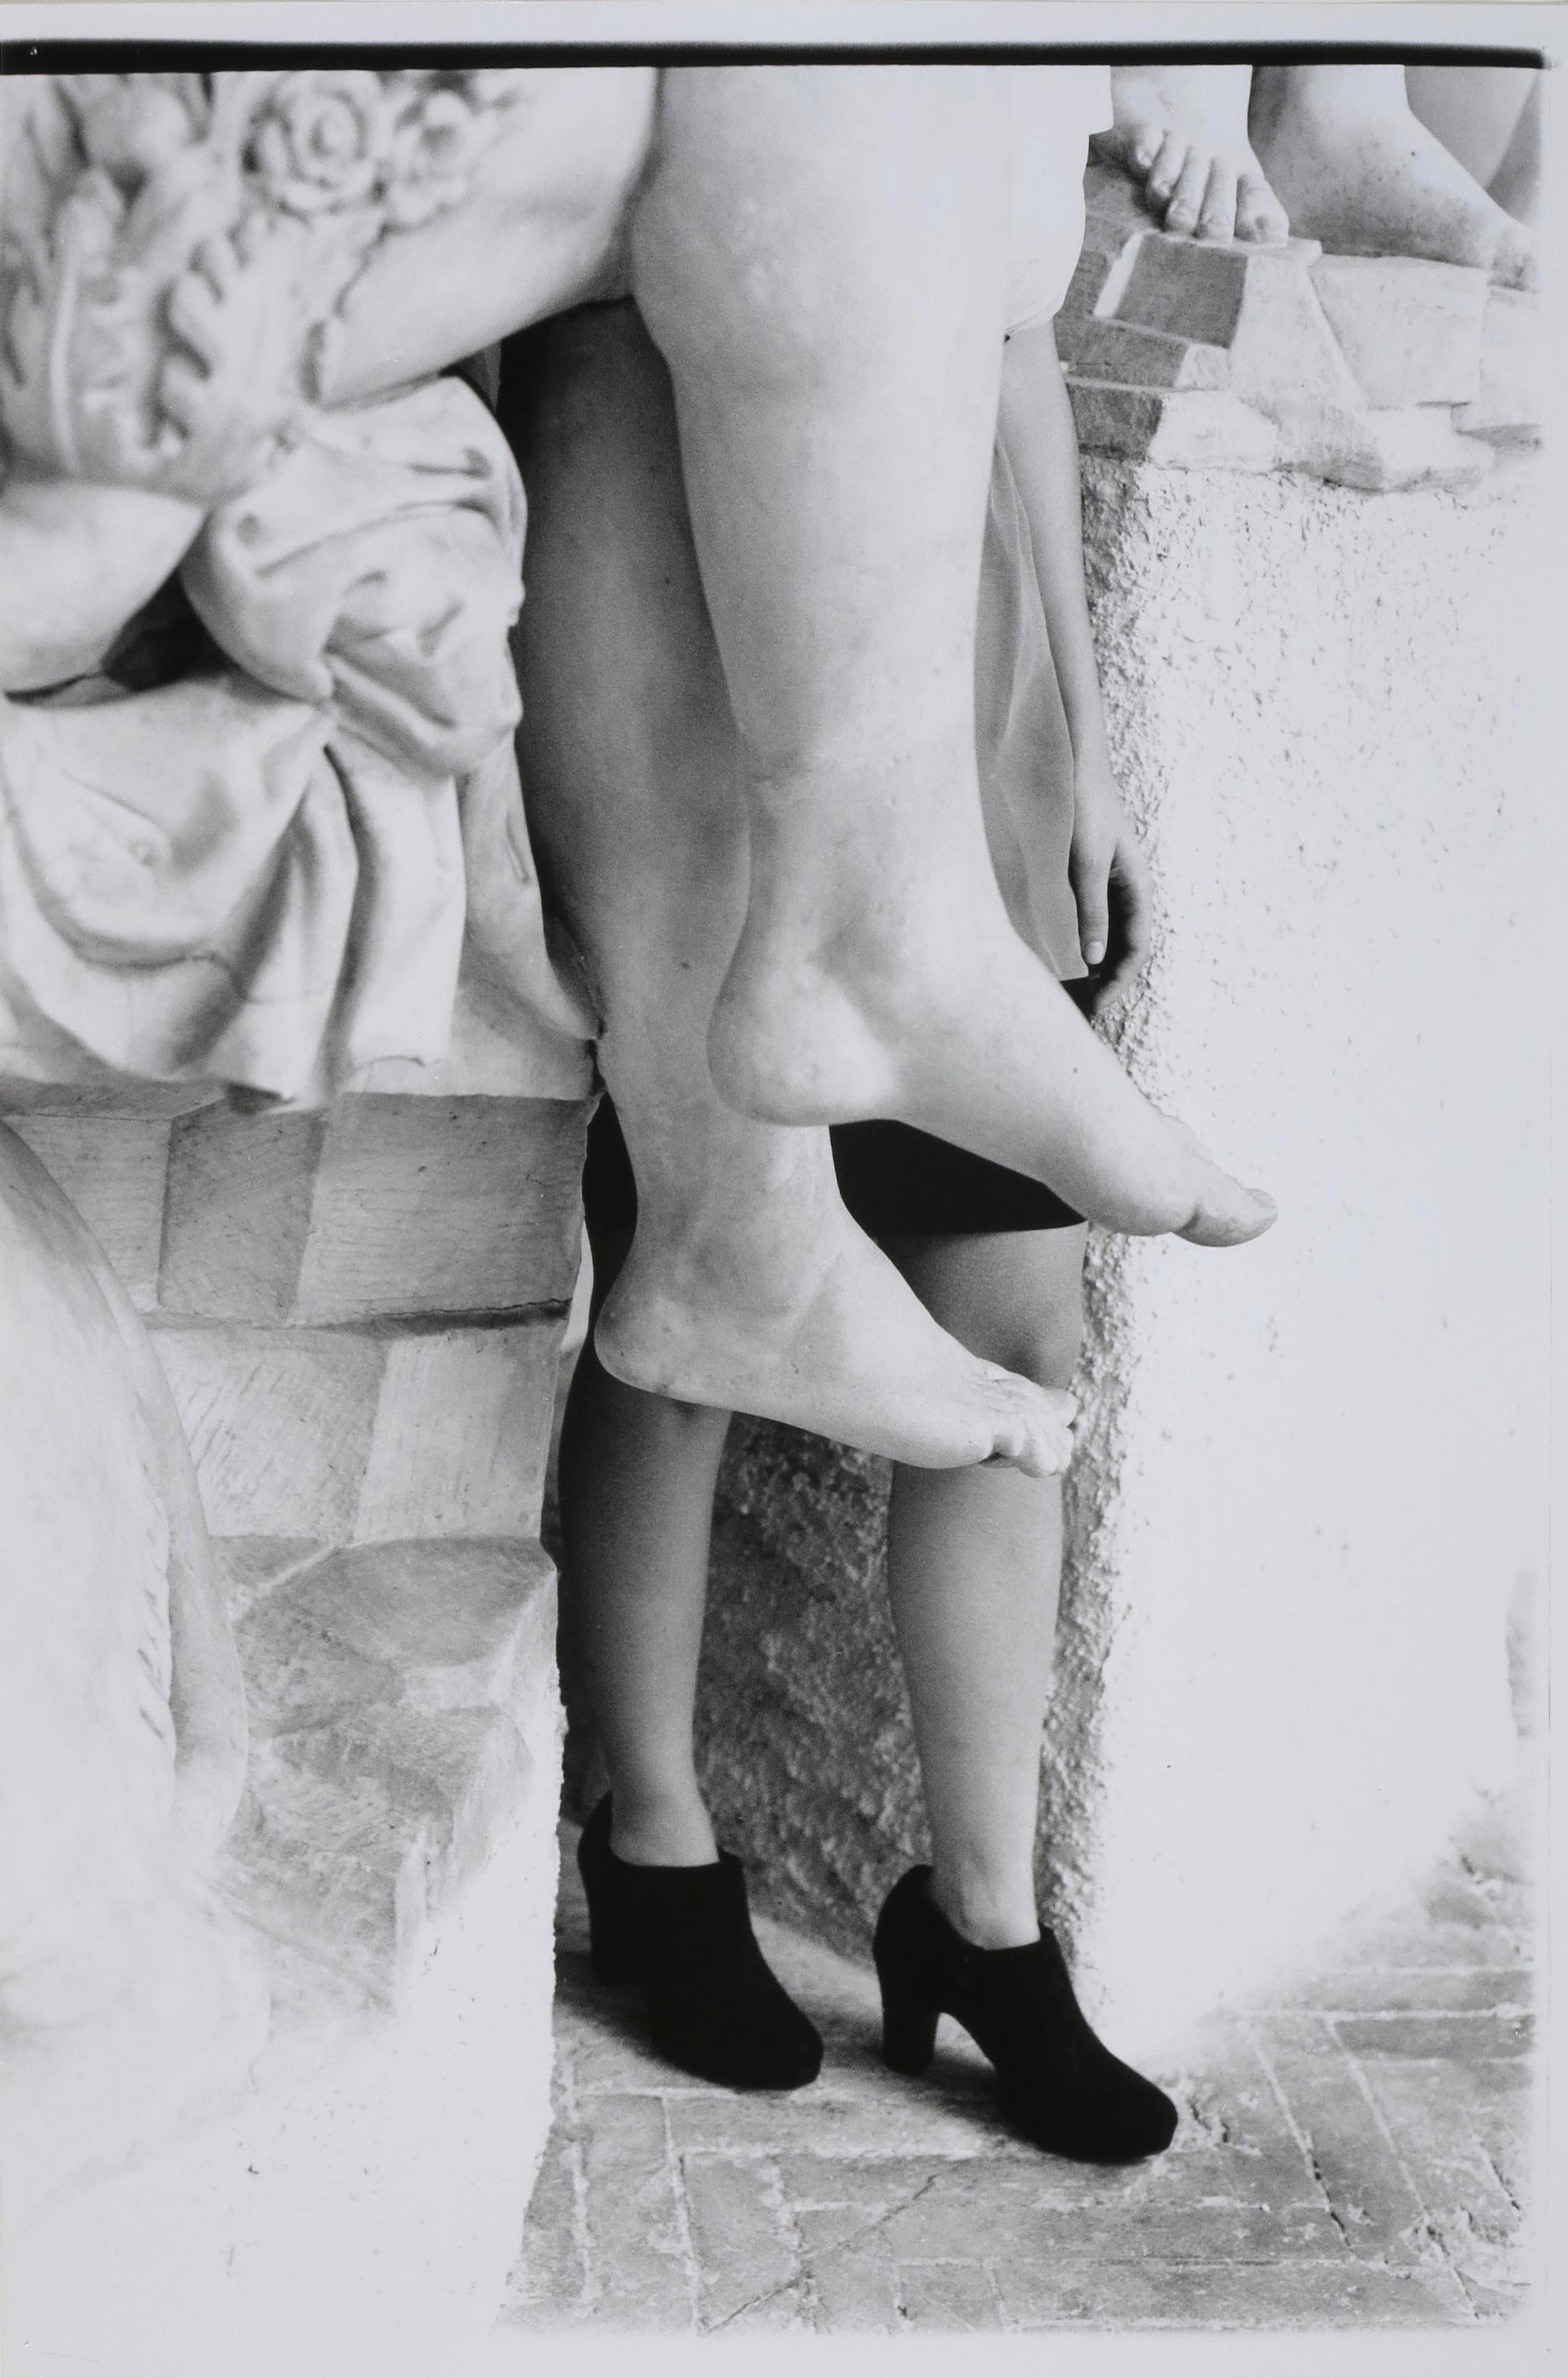 Legs at the Bargello  2014  gelatin silver print  36 x 24 inches